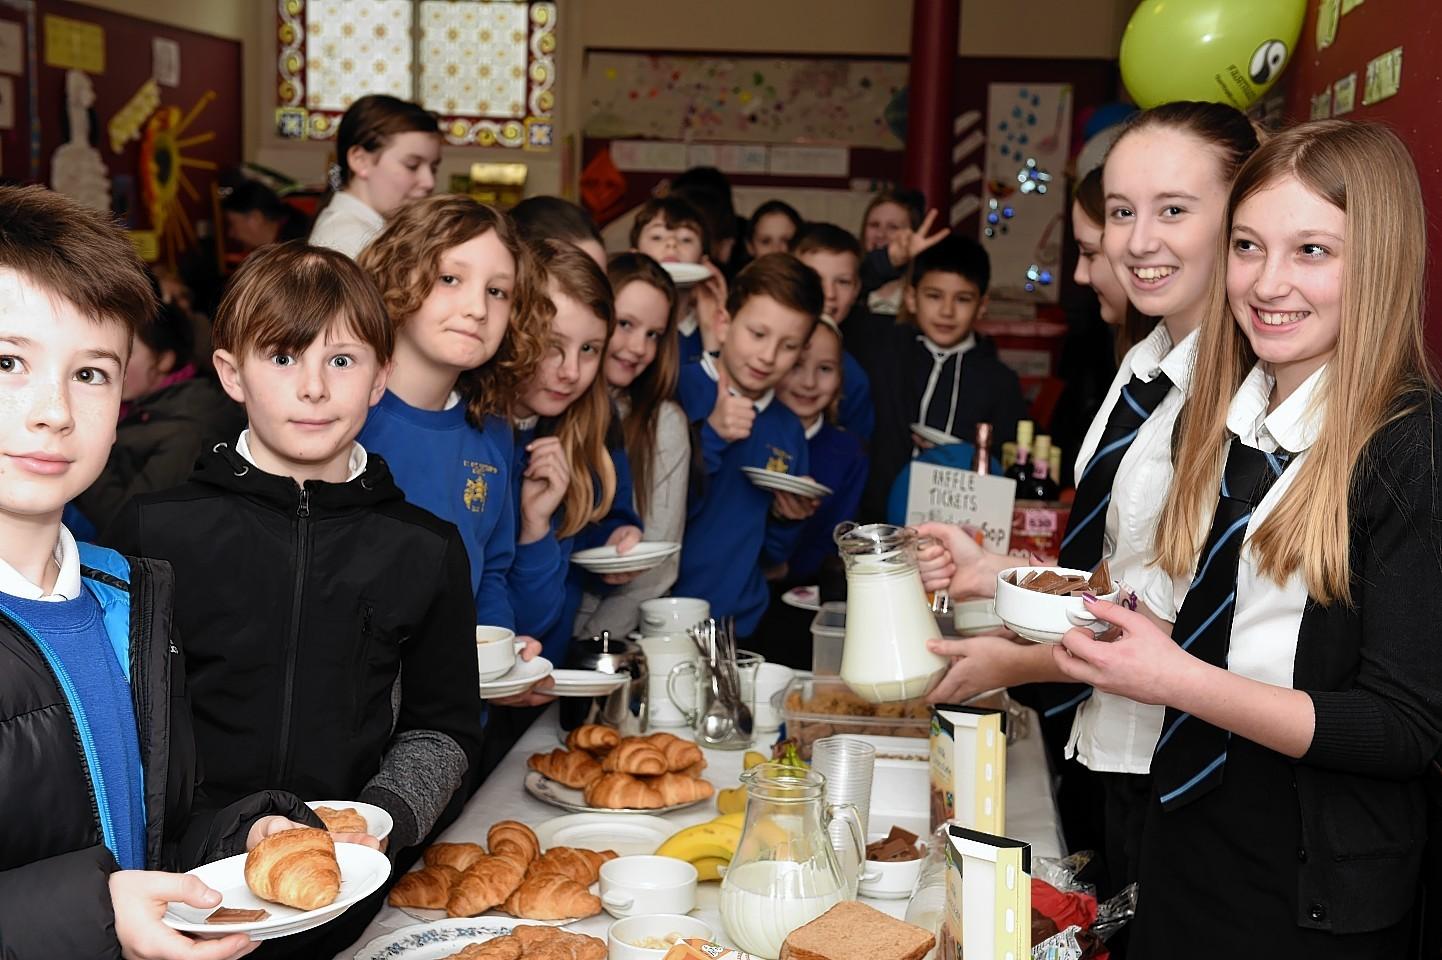 Fairtrade Big Breakfast at St Giles Church, High Street, Elgin. Picture by Gordon Lennox